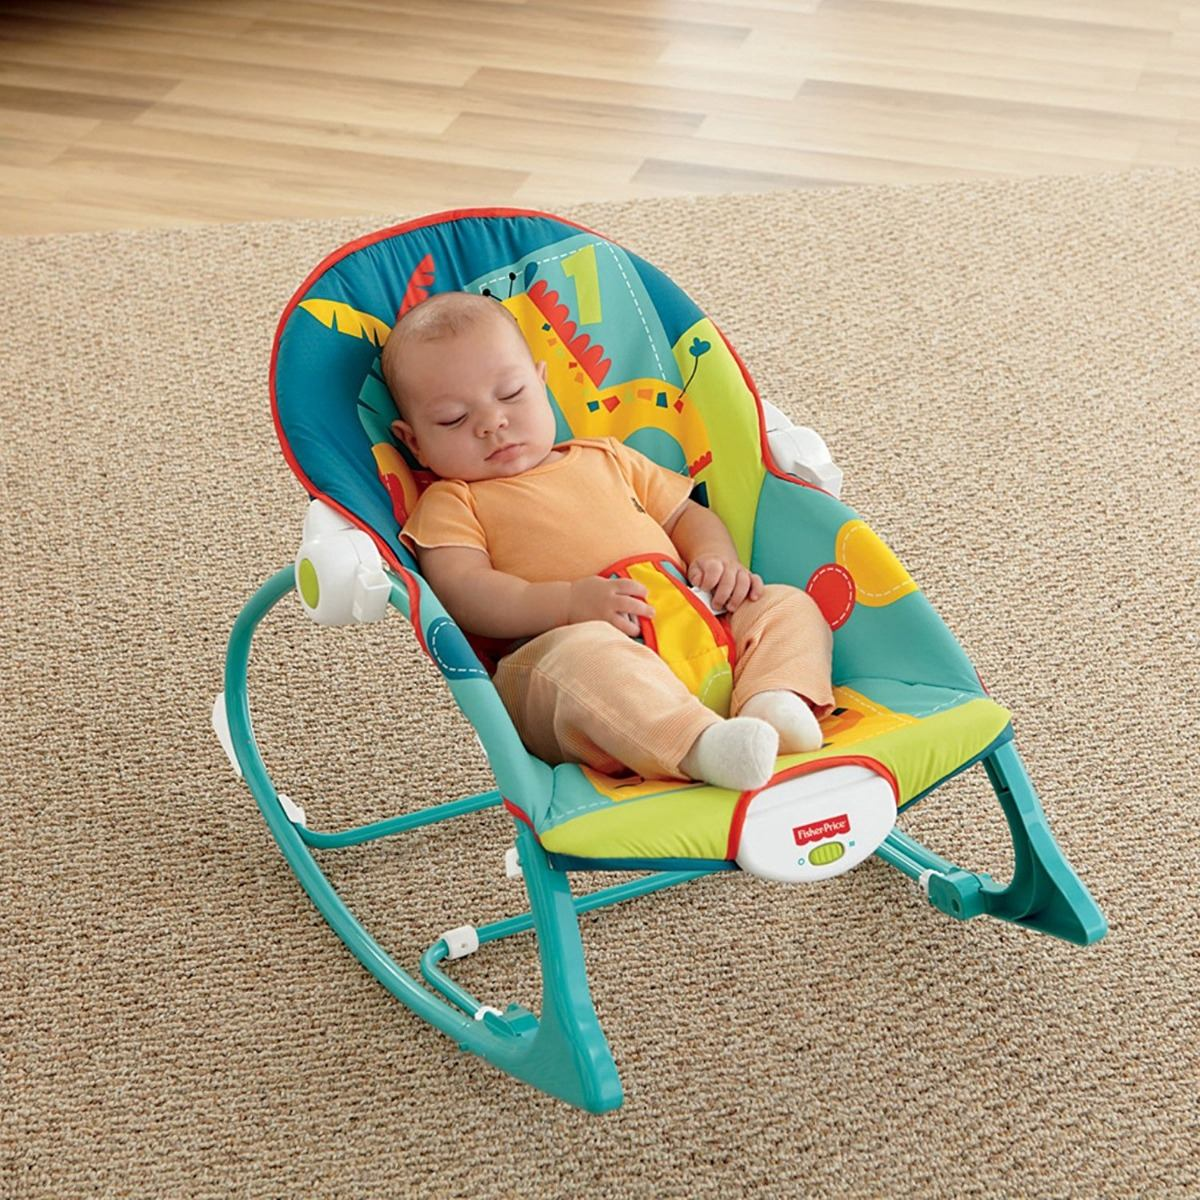 8b04e3b31 Cargando zoom... silla bebe mecedora vibradora fisher price dark safari